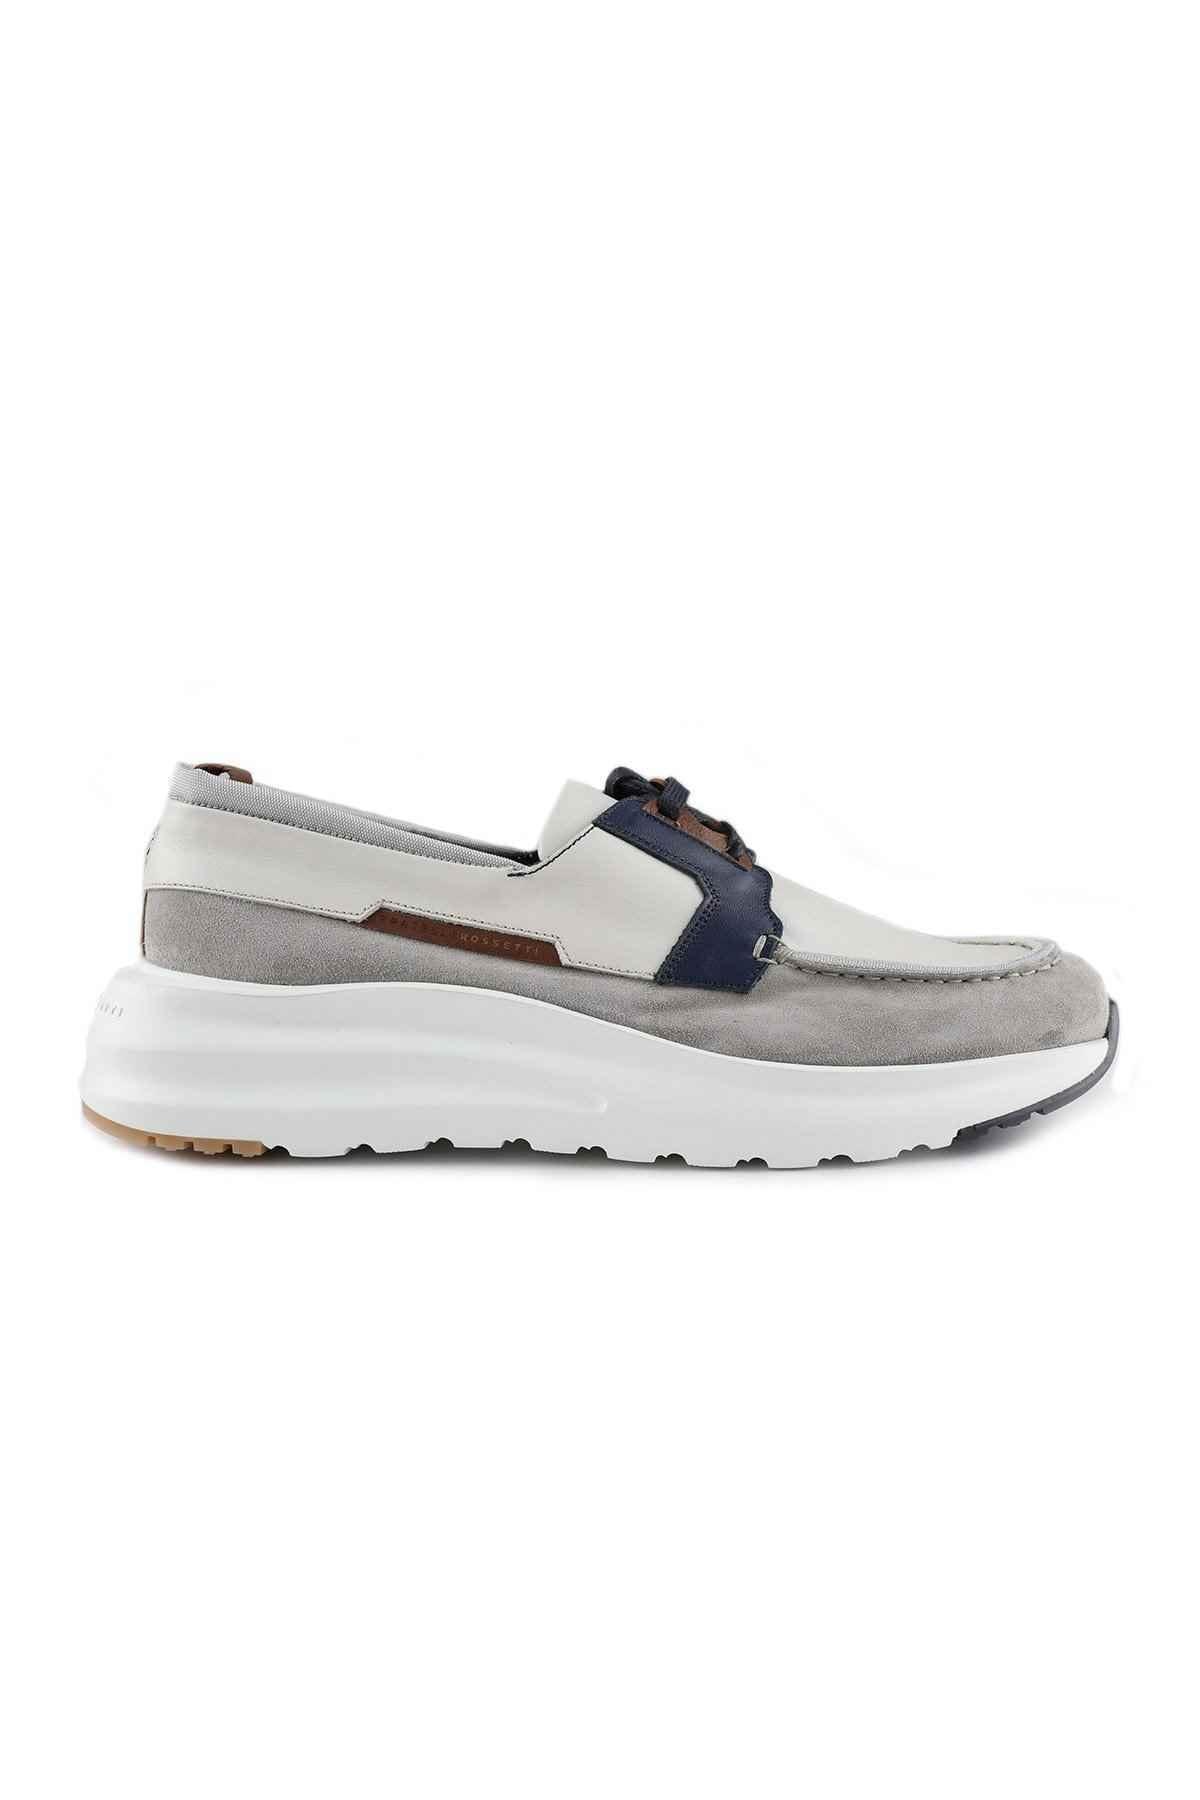 Fratelli Rossetti Erkek Sneaker Ayakkabı 1